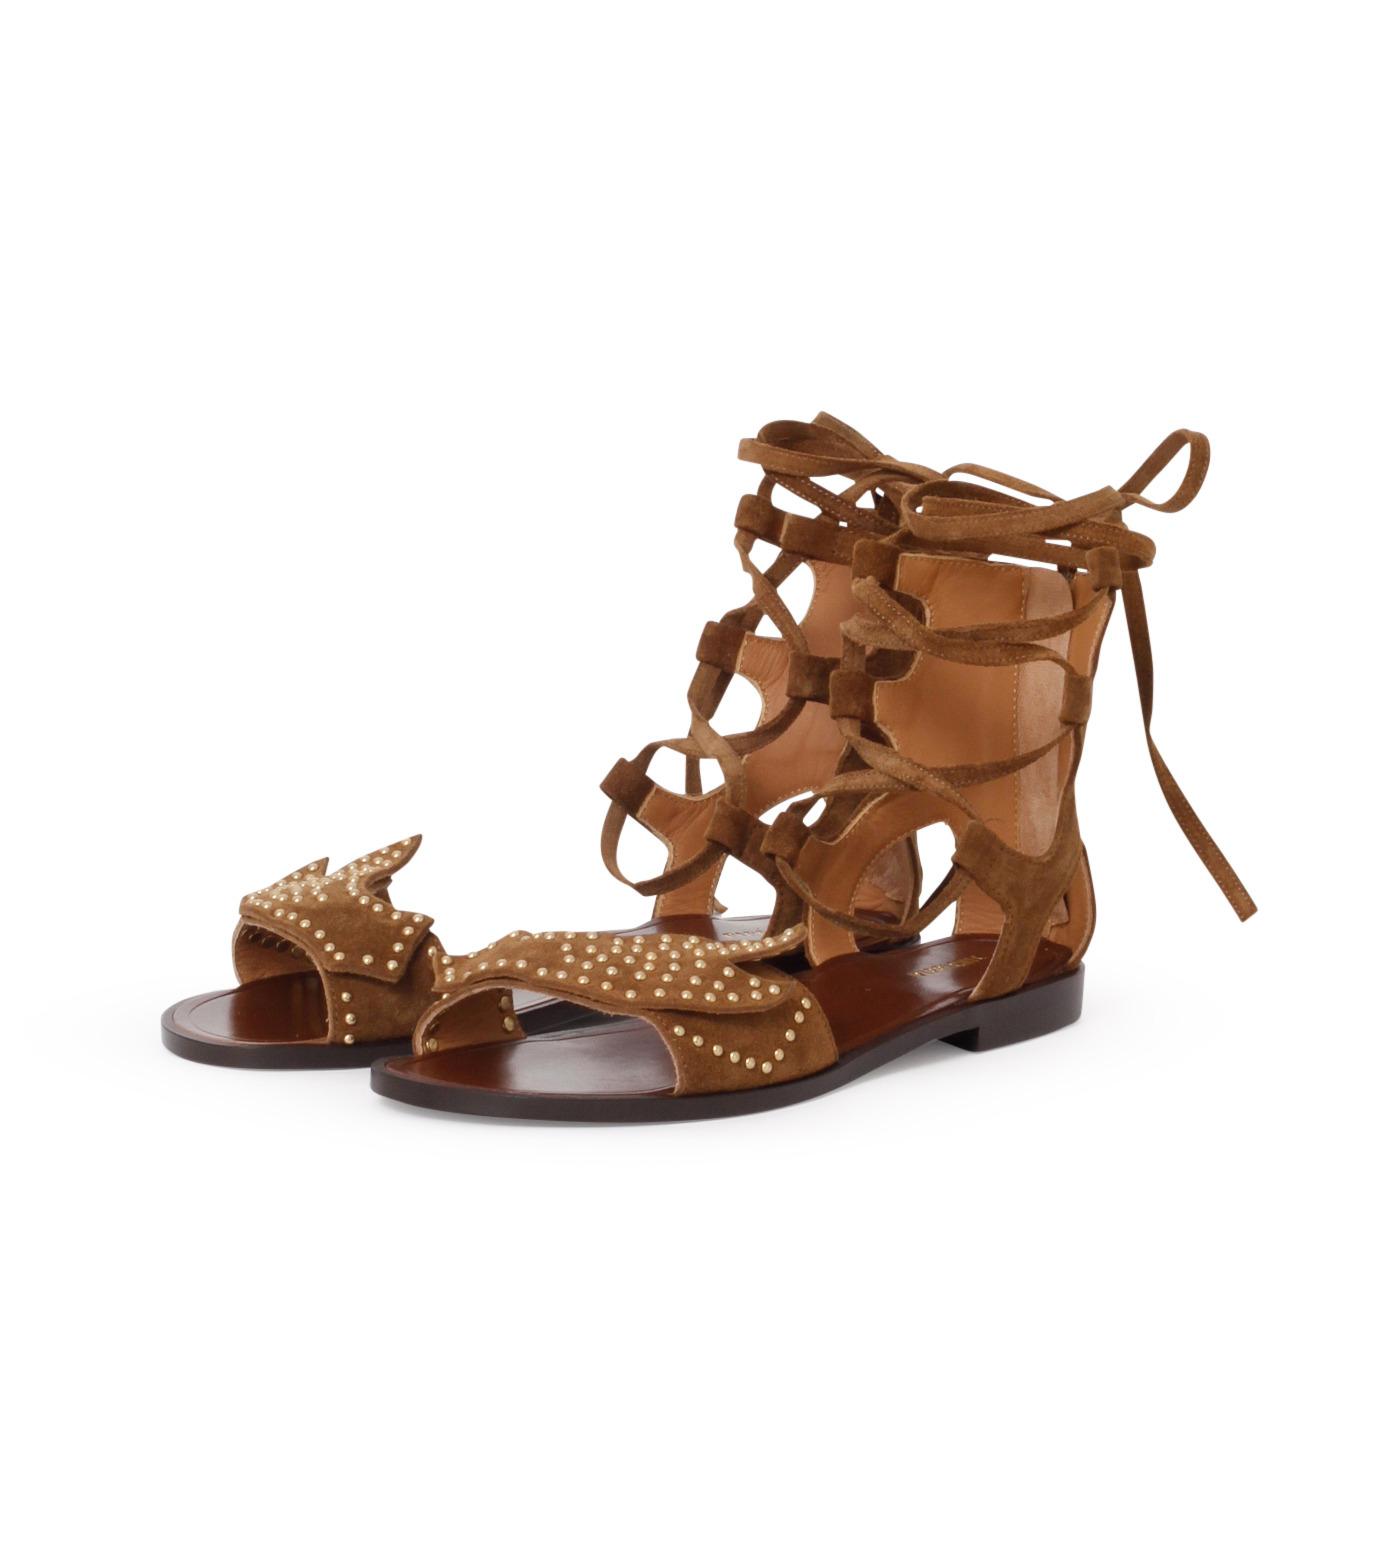 PIPPICHIC(ピッピシック)のbird lace-up flat sandal-BROWN(シューズ/shoes)-PP16S-BIRD24-42 拡大詳細画像2